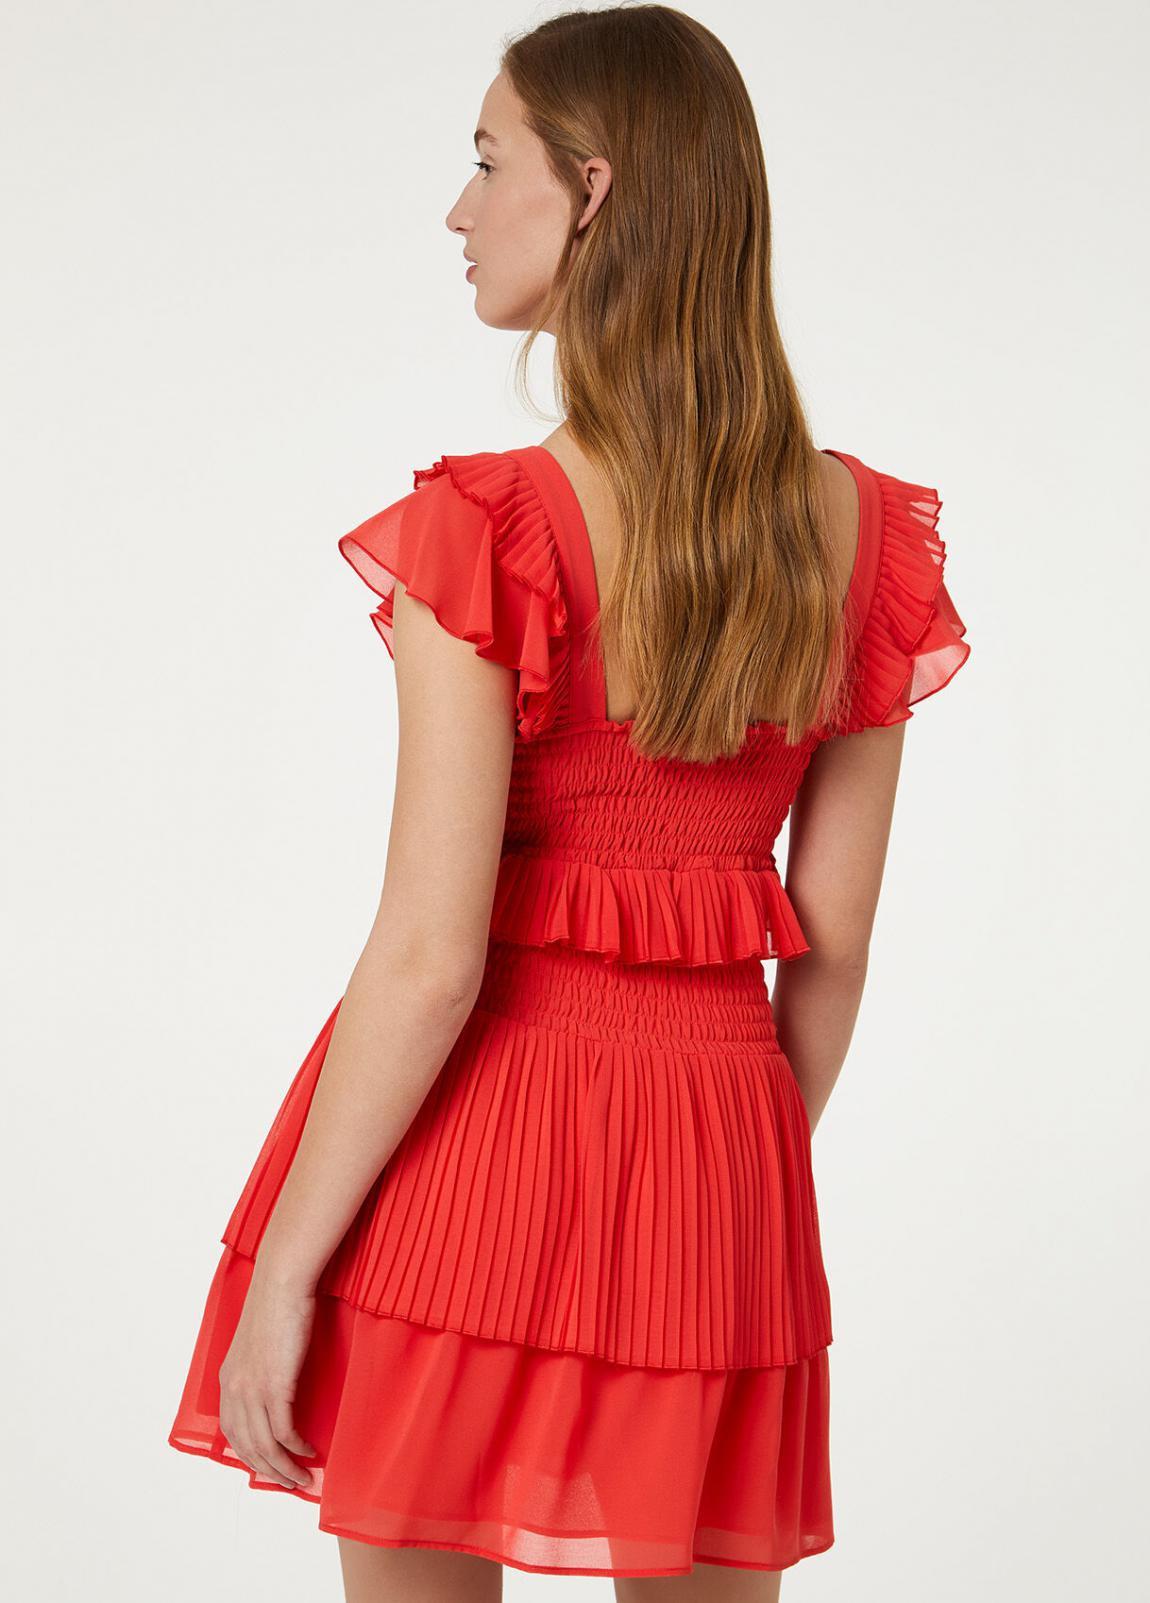 Damen Kurzes Kleid Mit Volants  Liu Jo Kleider — Pax Domini